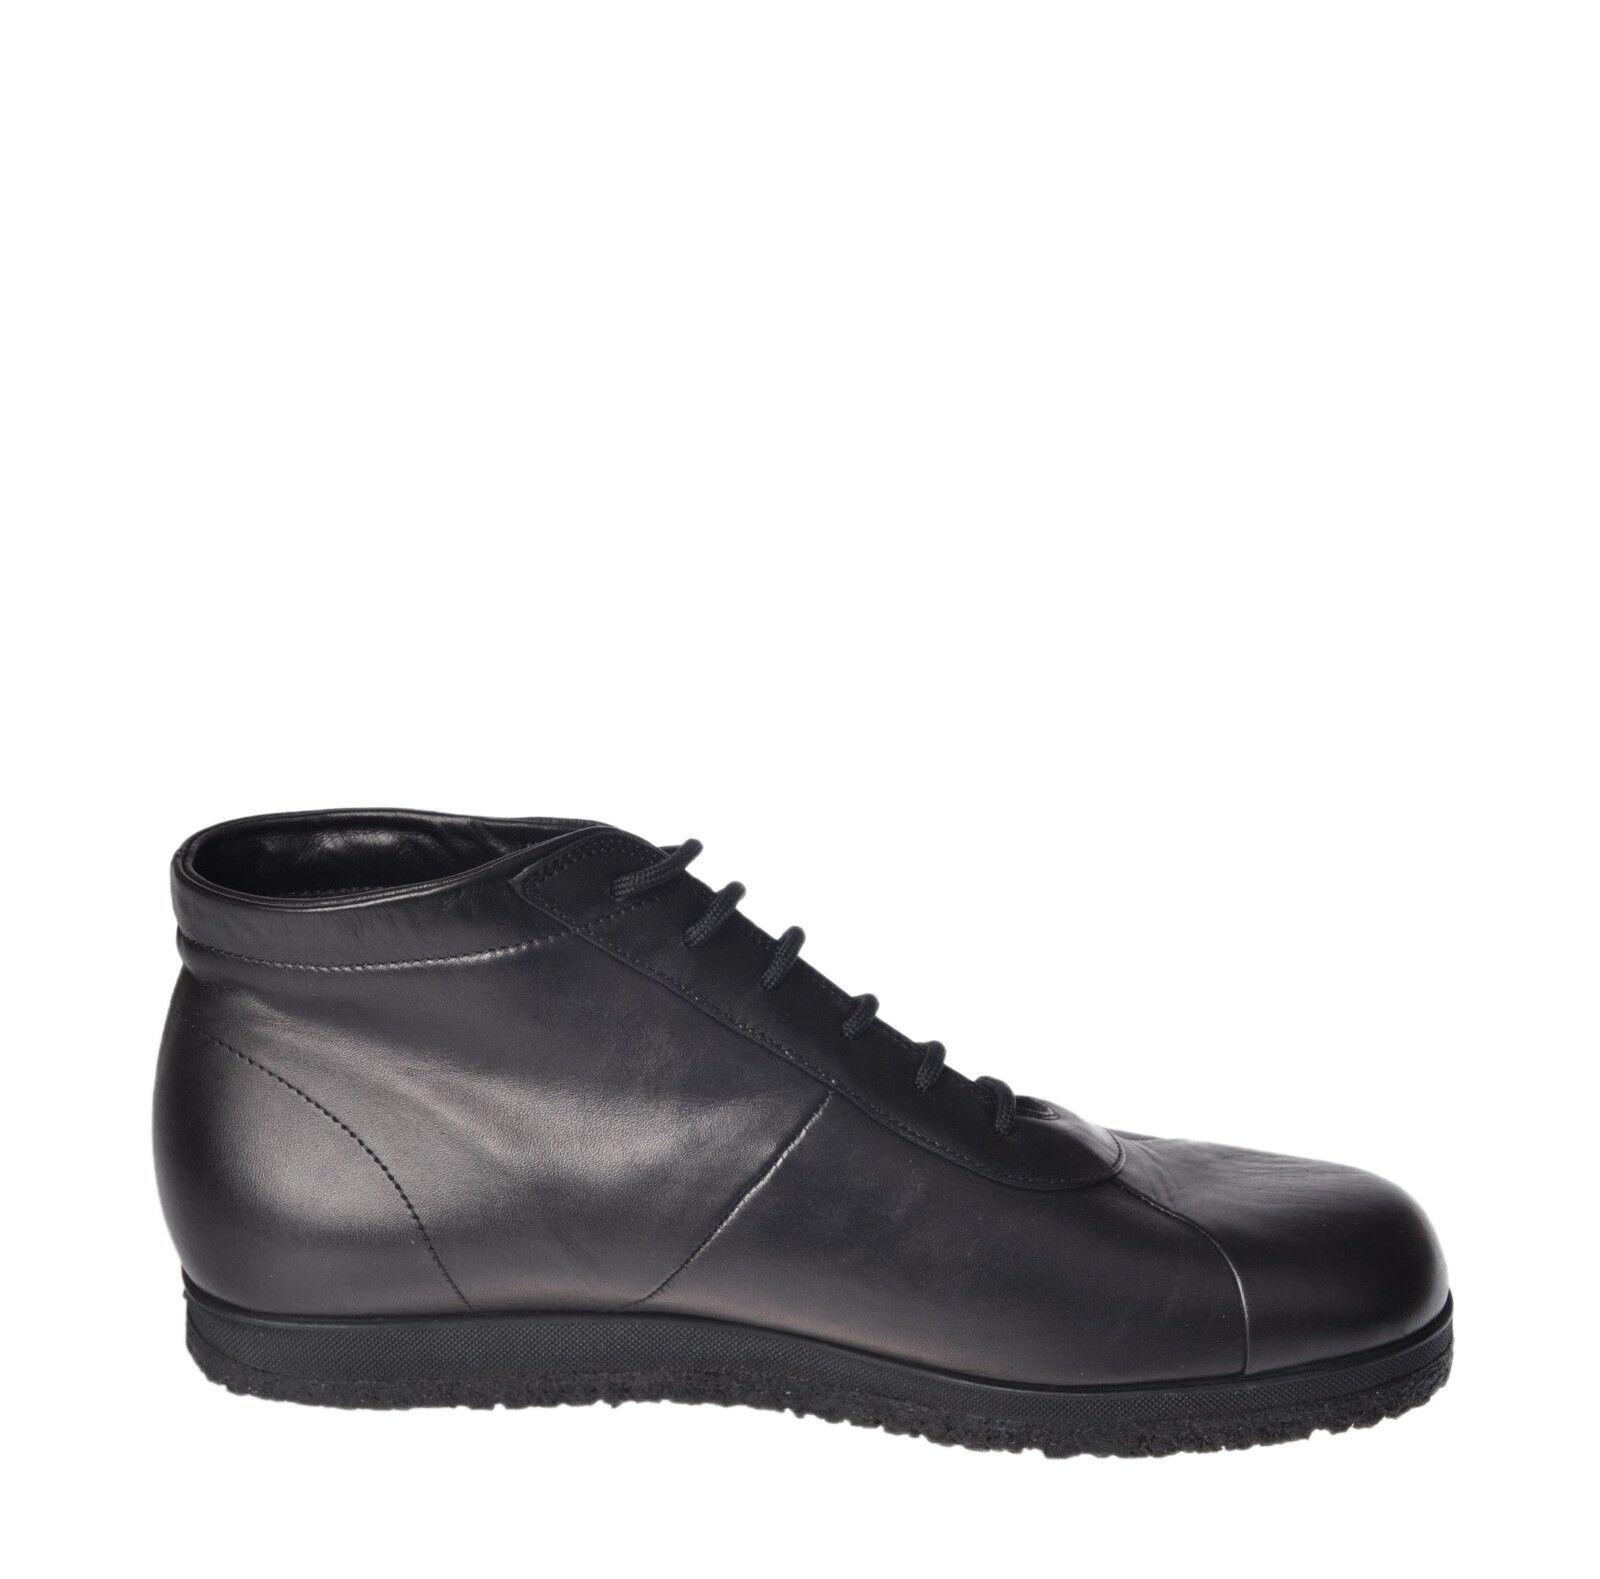 Barleycorn - Schuhe-Sneakers basse - Damenschuhe - Nero - 5145920C183643